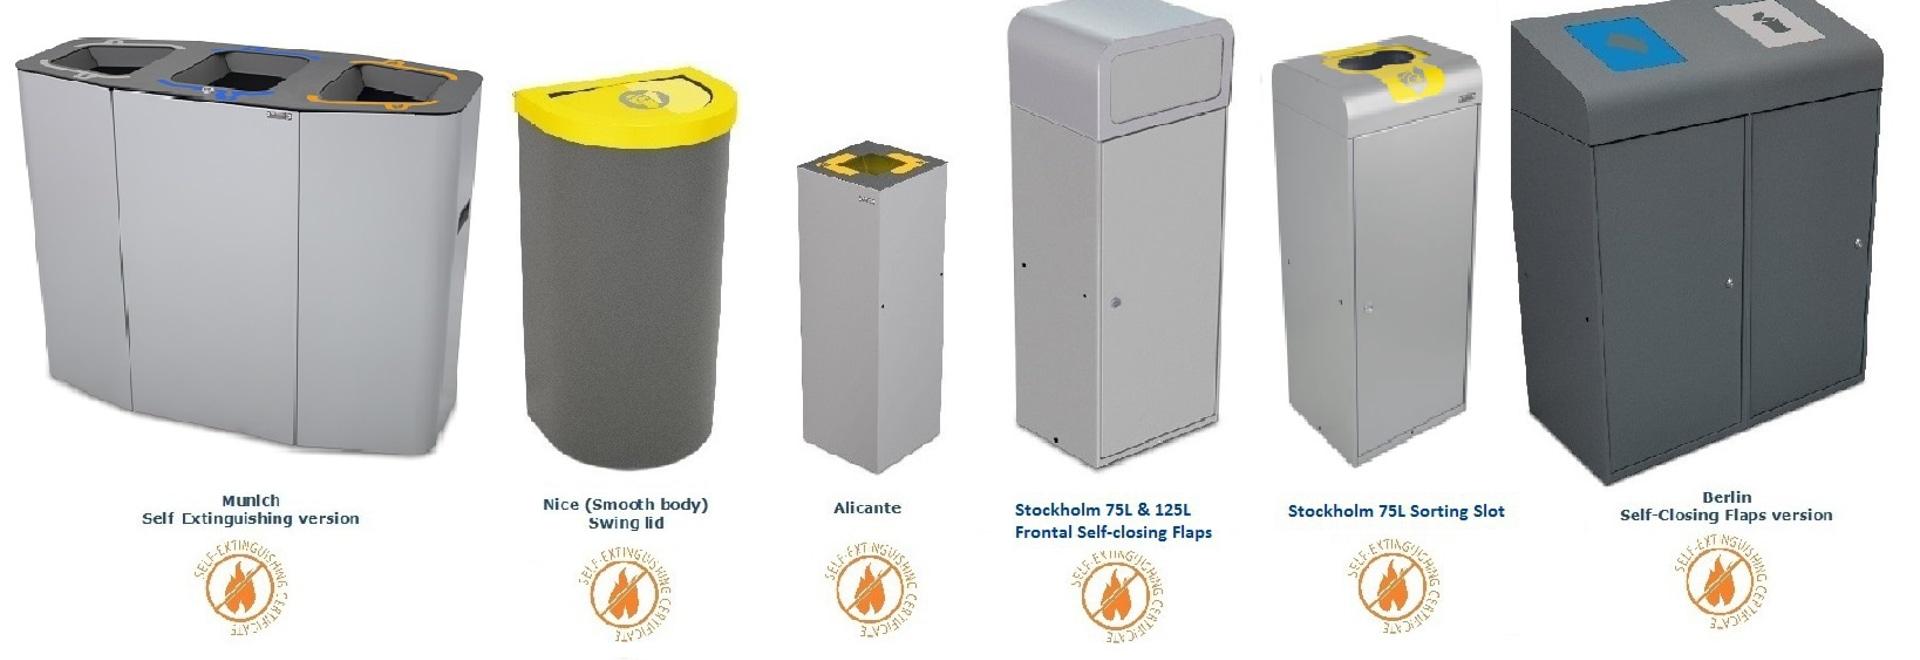 Papeleras Auto-Extingubles certificadas